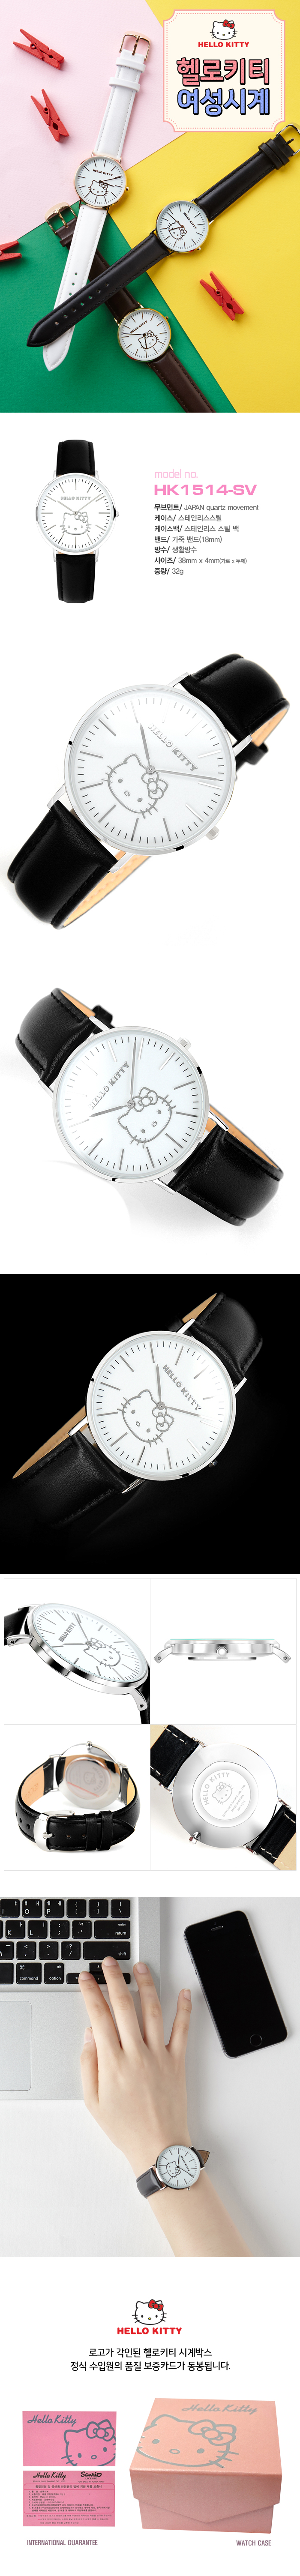 HK1514-SV - 헬로키티, 65,000원, 여성시계, 캐릭터시계